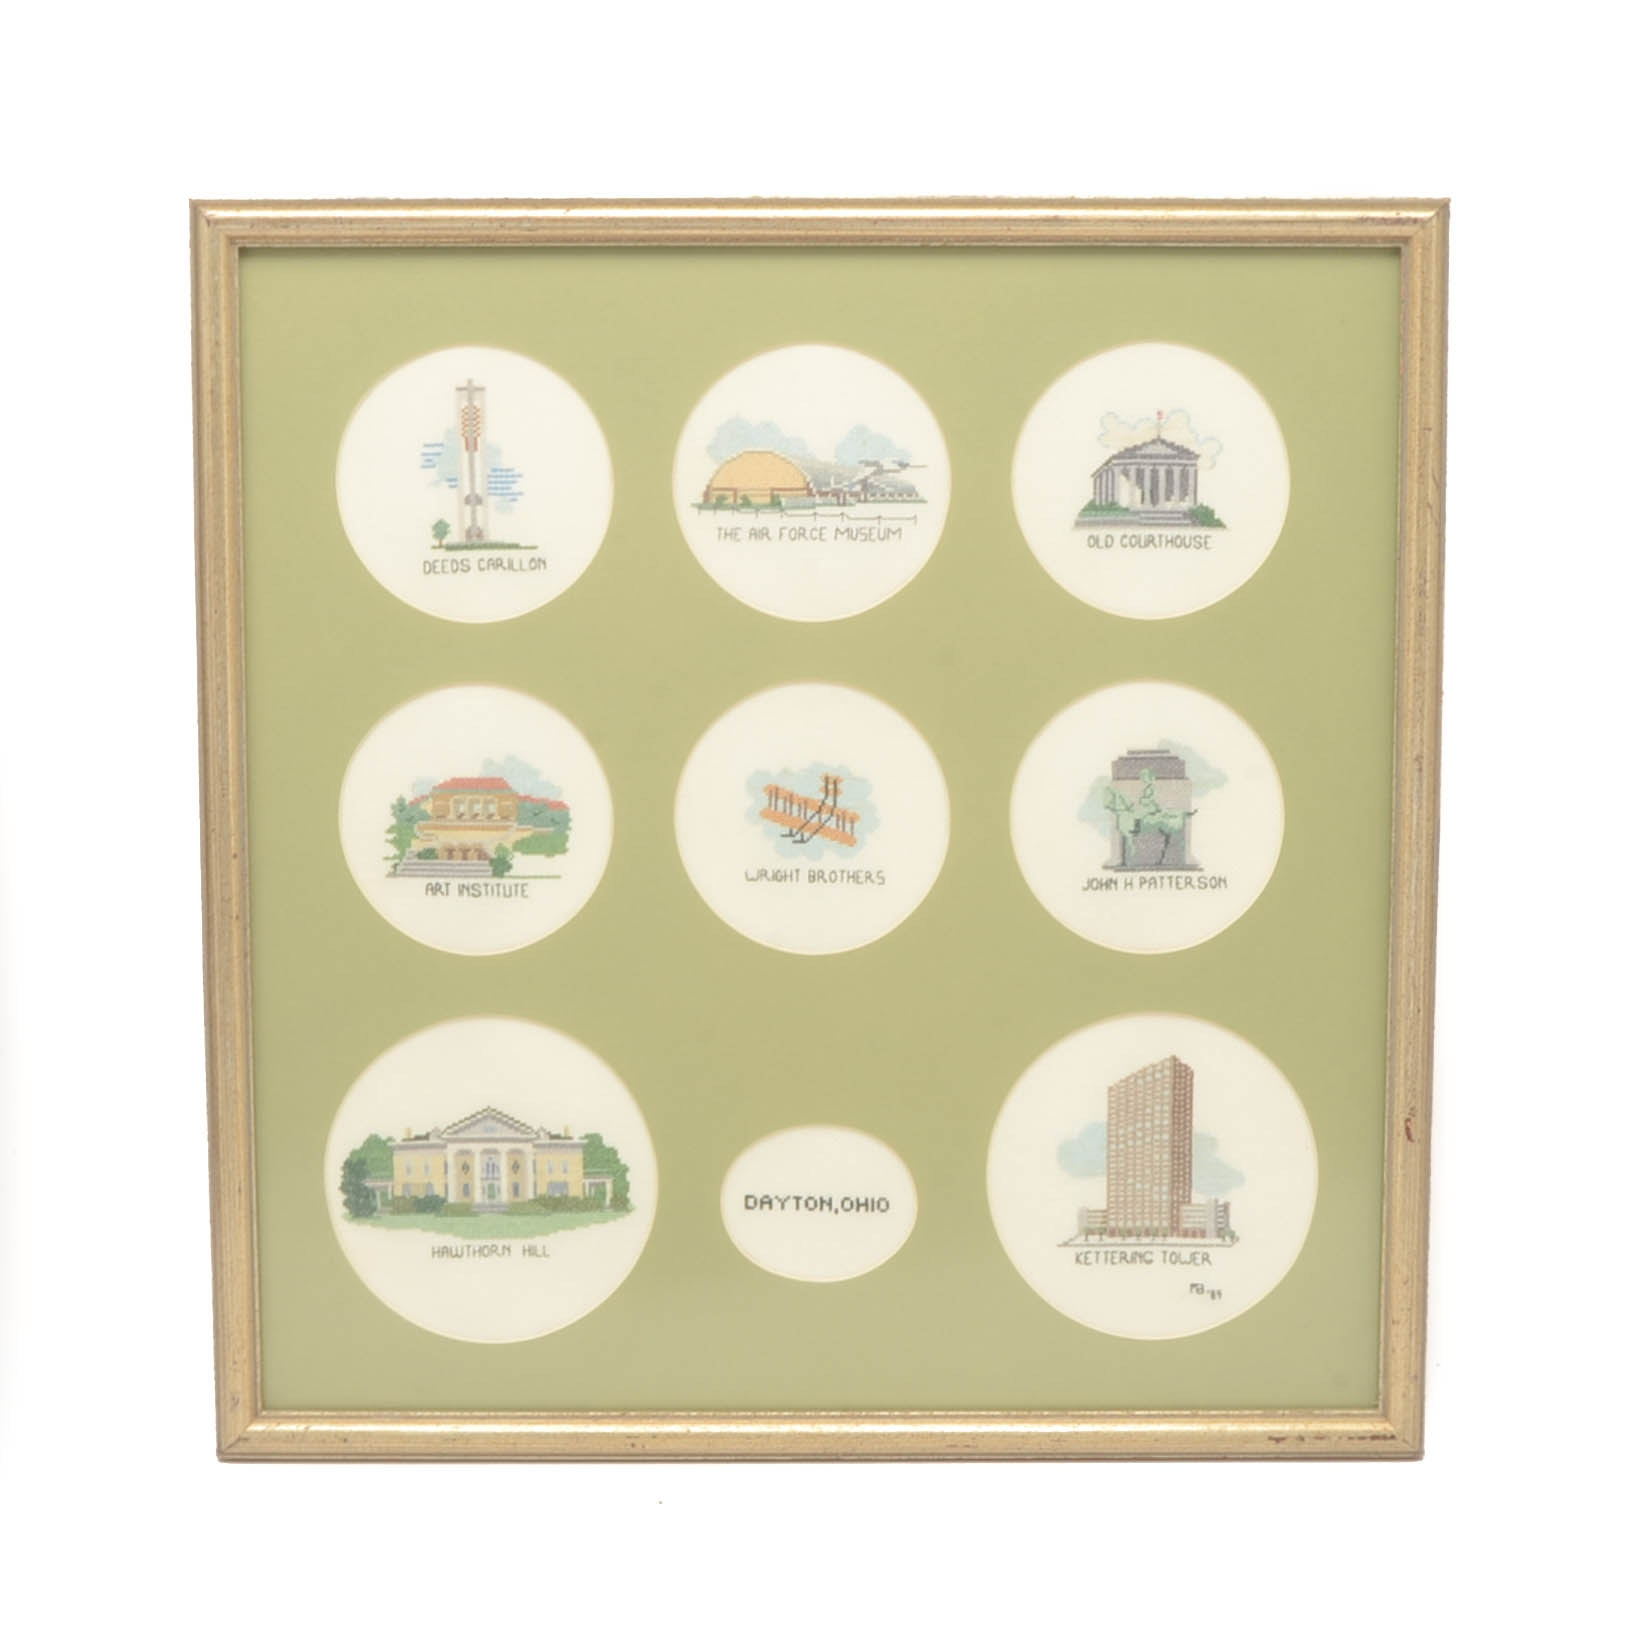 Signed Handmade Cross-Stitch Embroidery of Dayton Ohio Landmarks